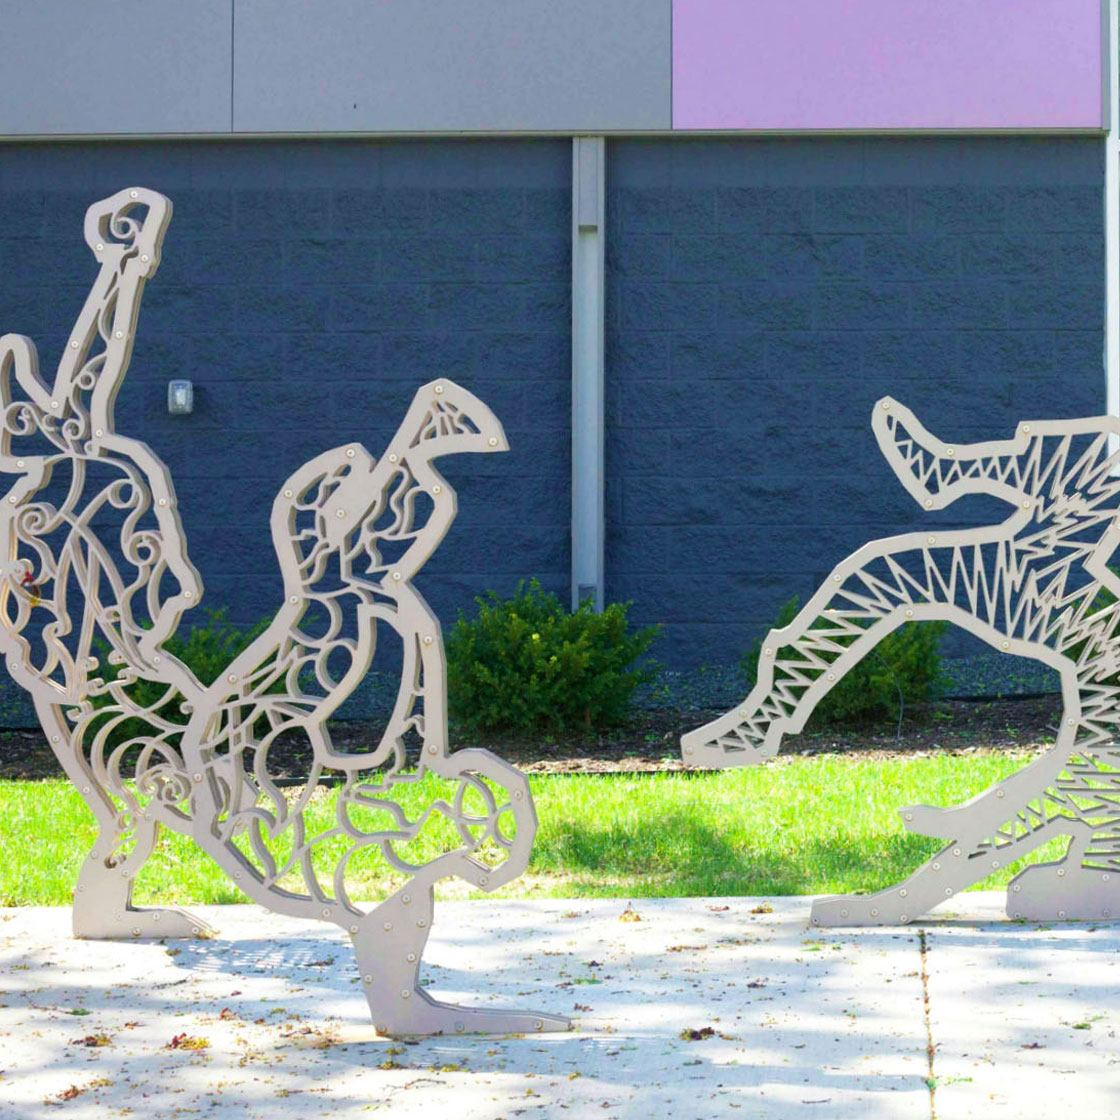 Bike racks in the shape of illustrative break dancers